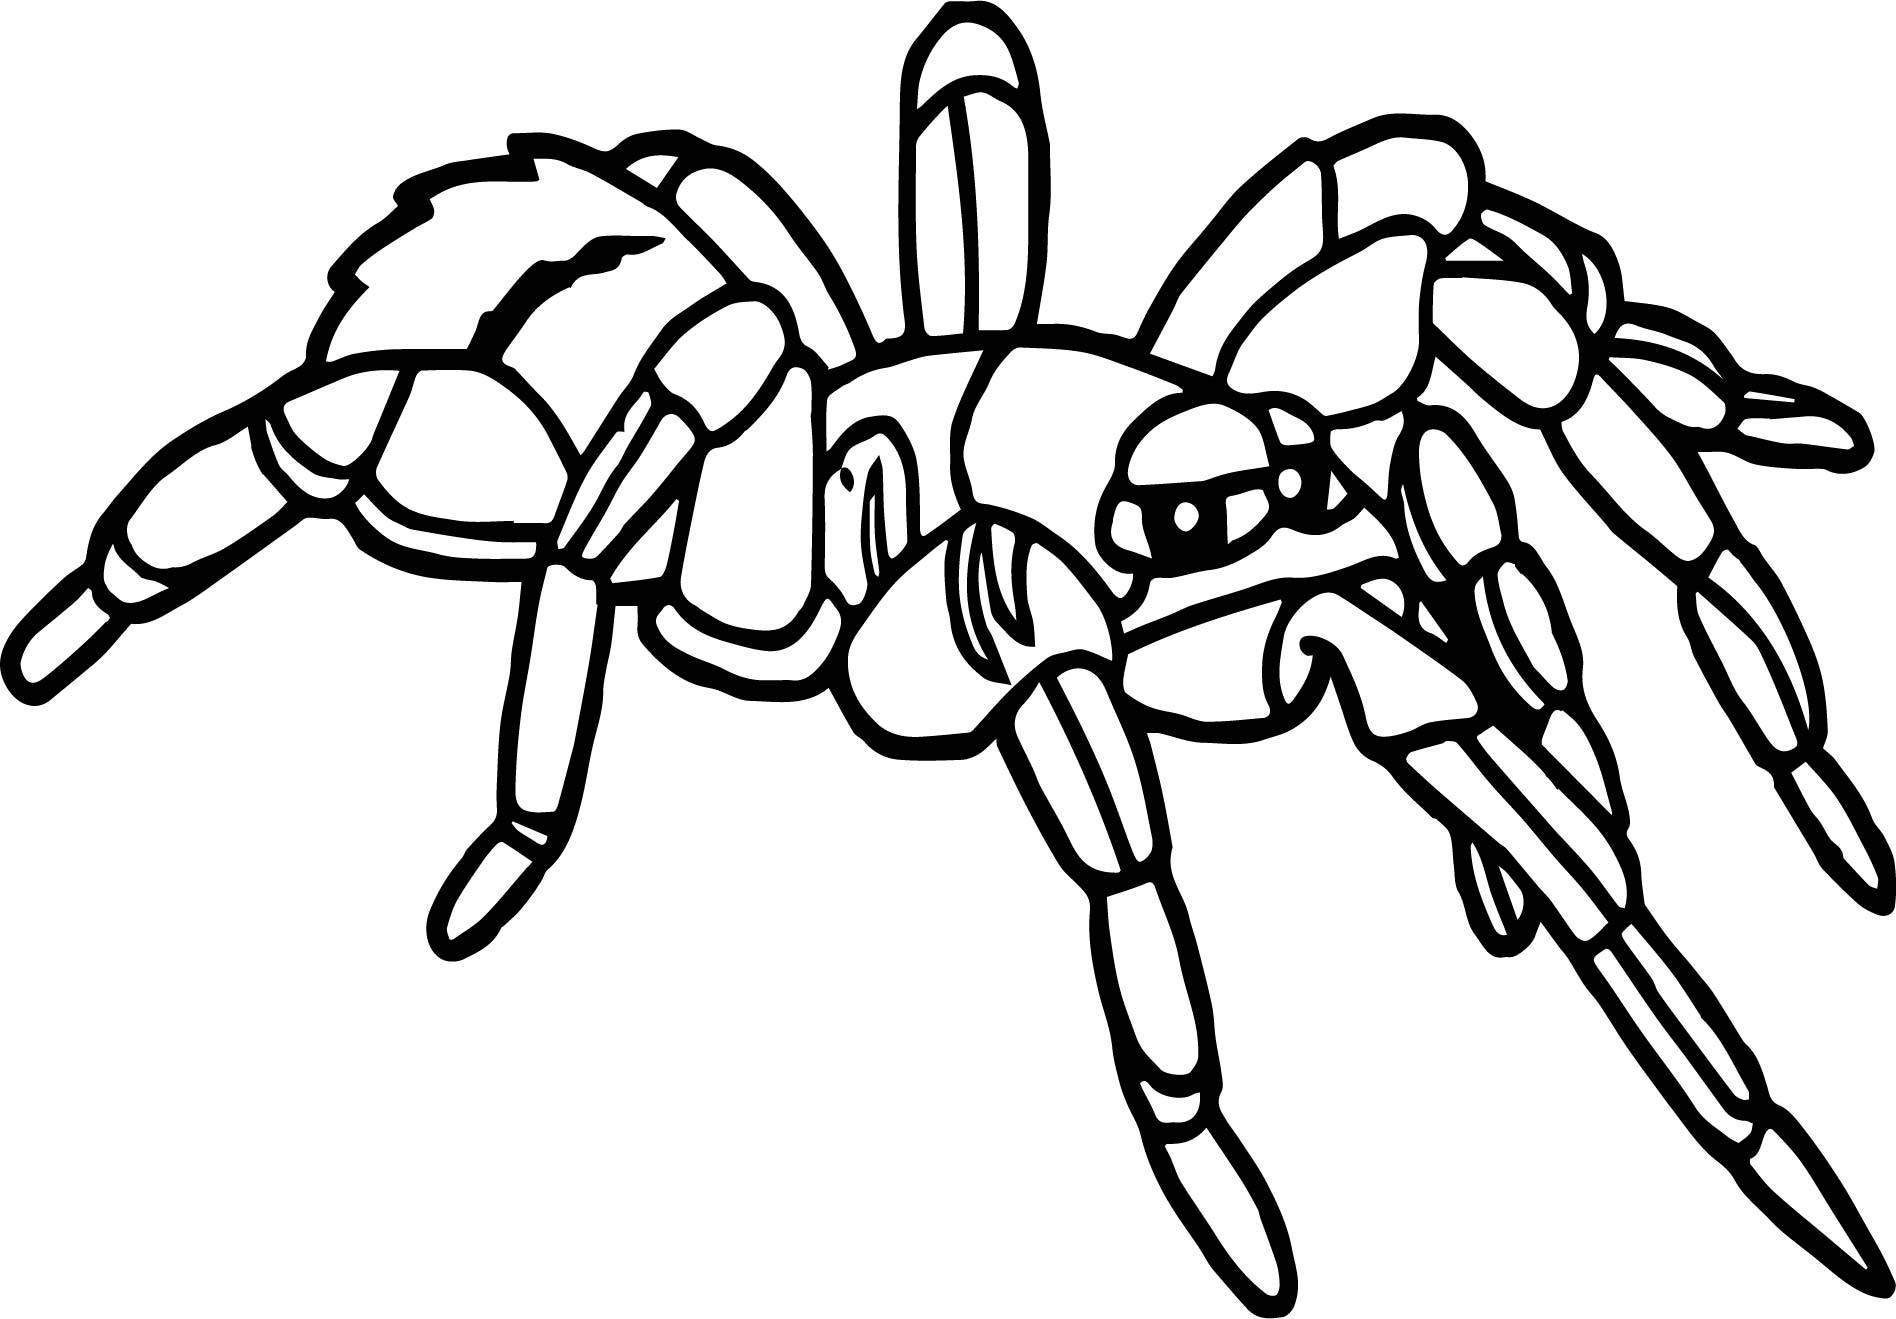 Rainforest Tarantula Coloring Page